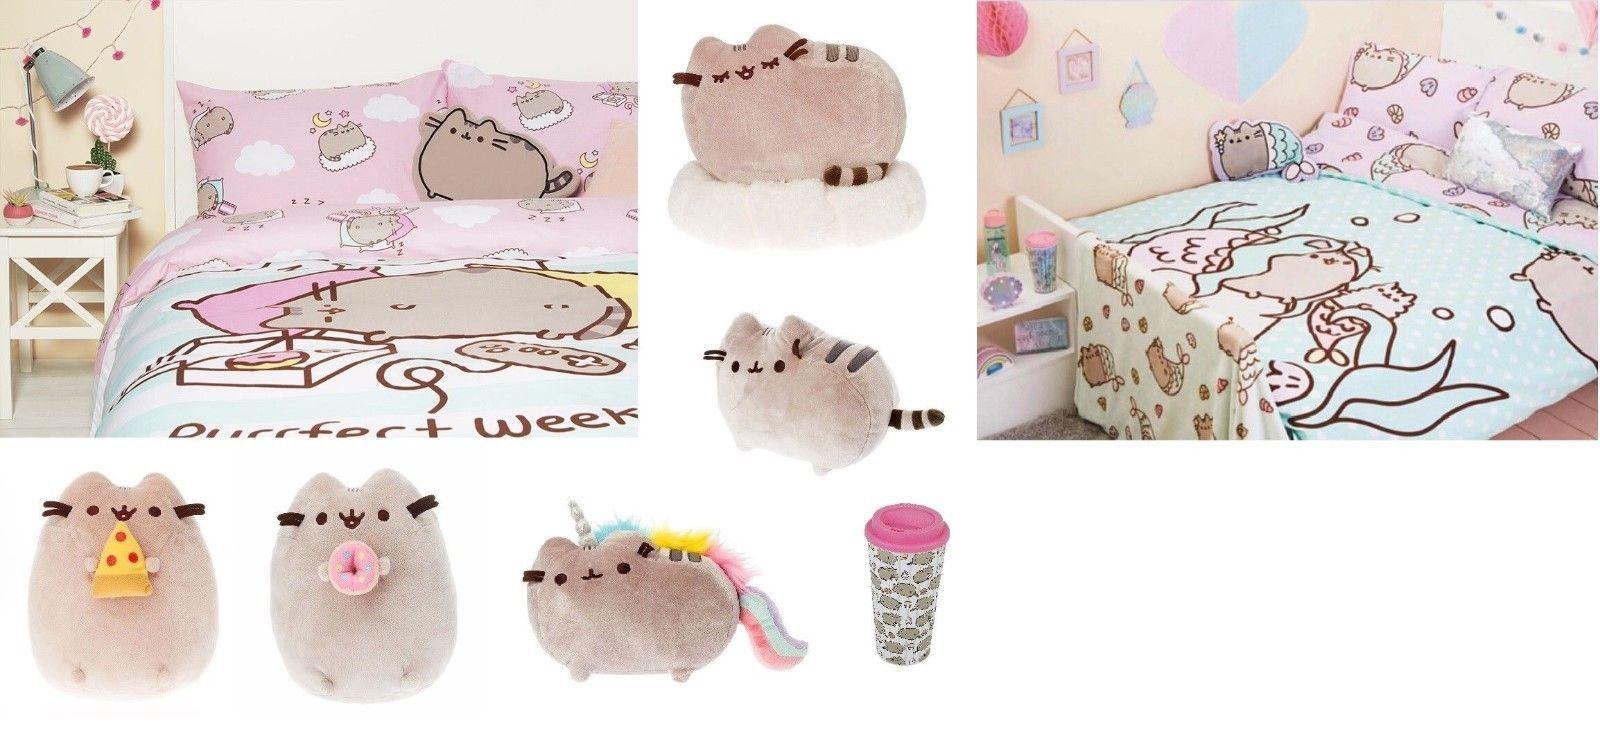 Disney Pusheen The Cat Single Double Duvet Cover Bed Set